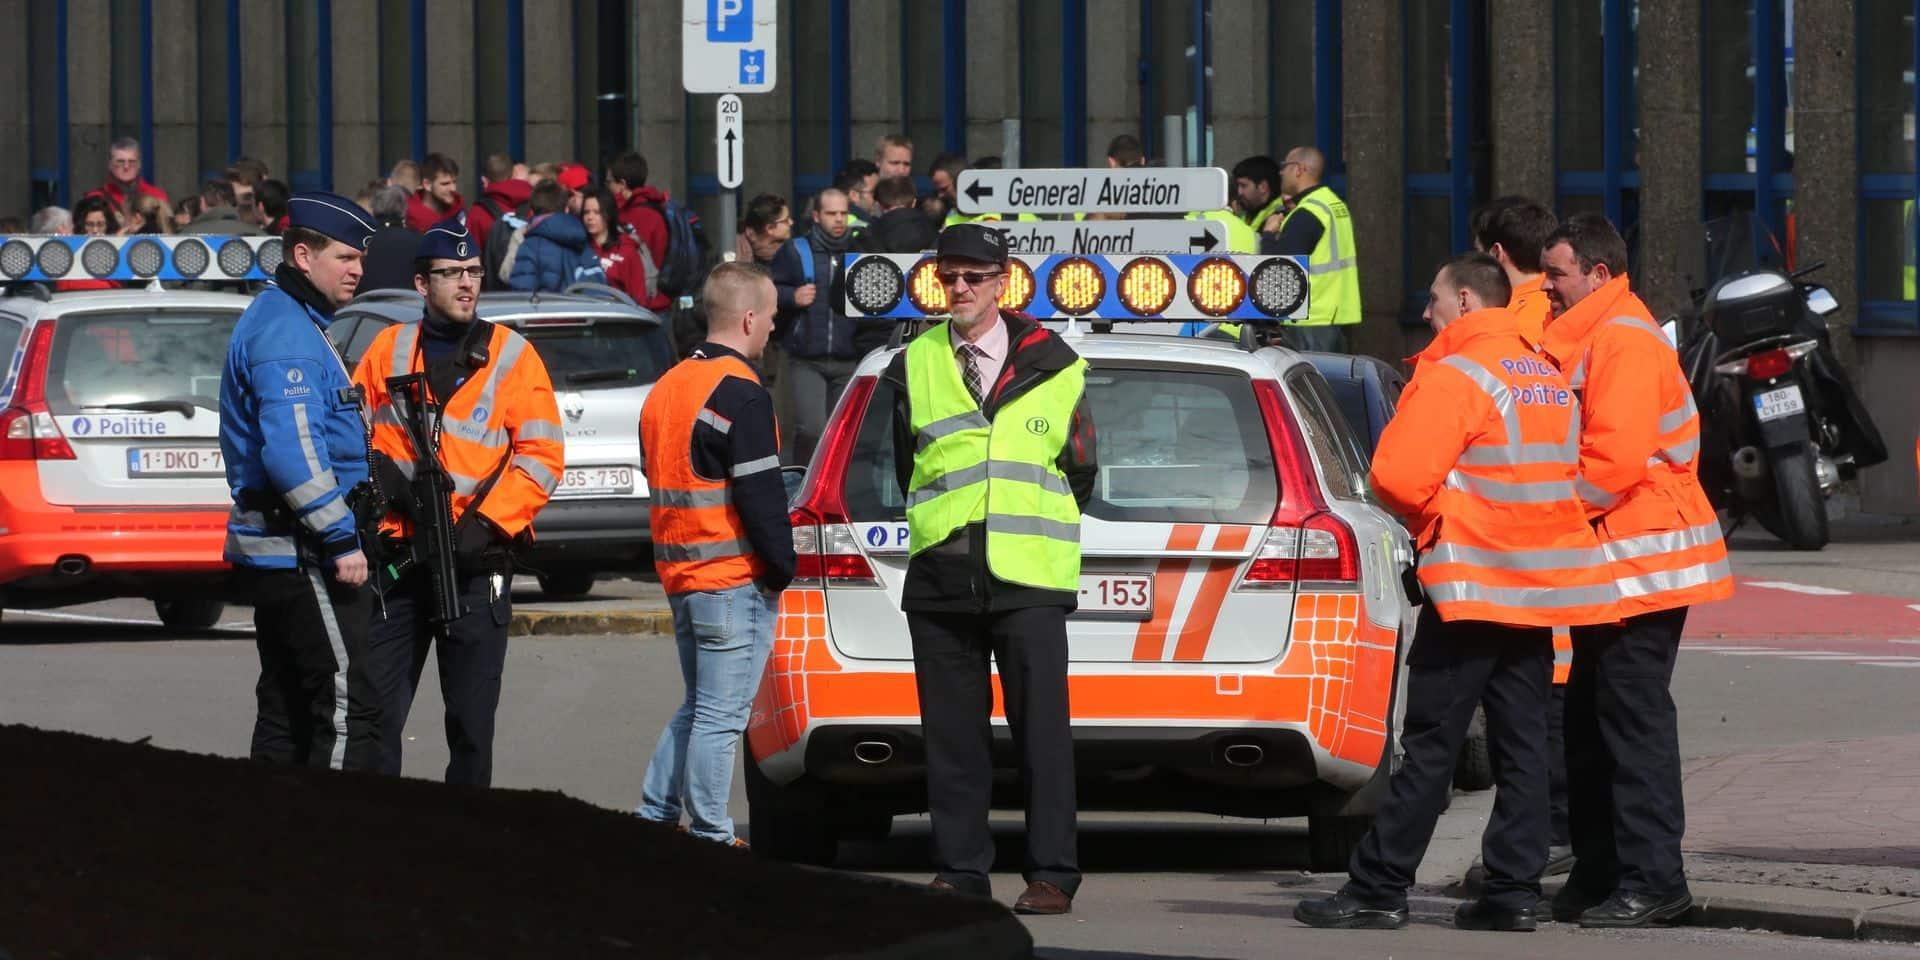 Qui sont les inculpés du procès des attentats de Bruxelles ?